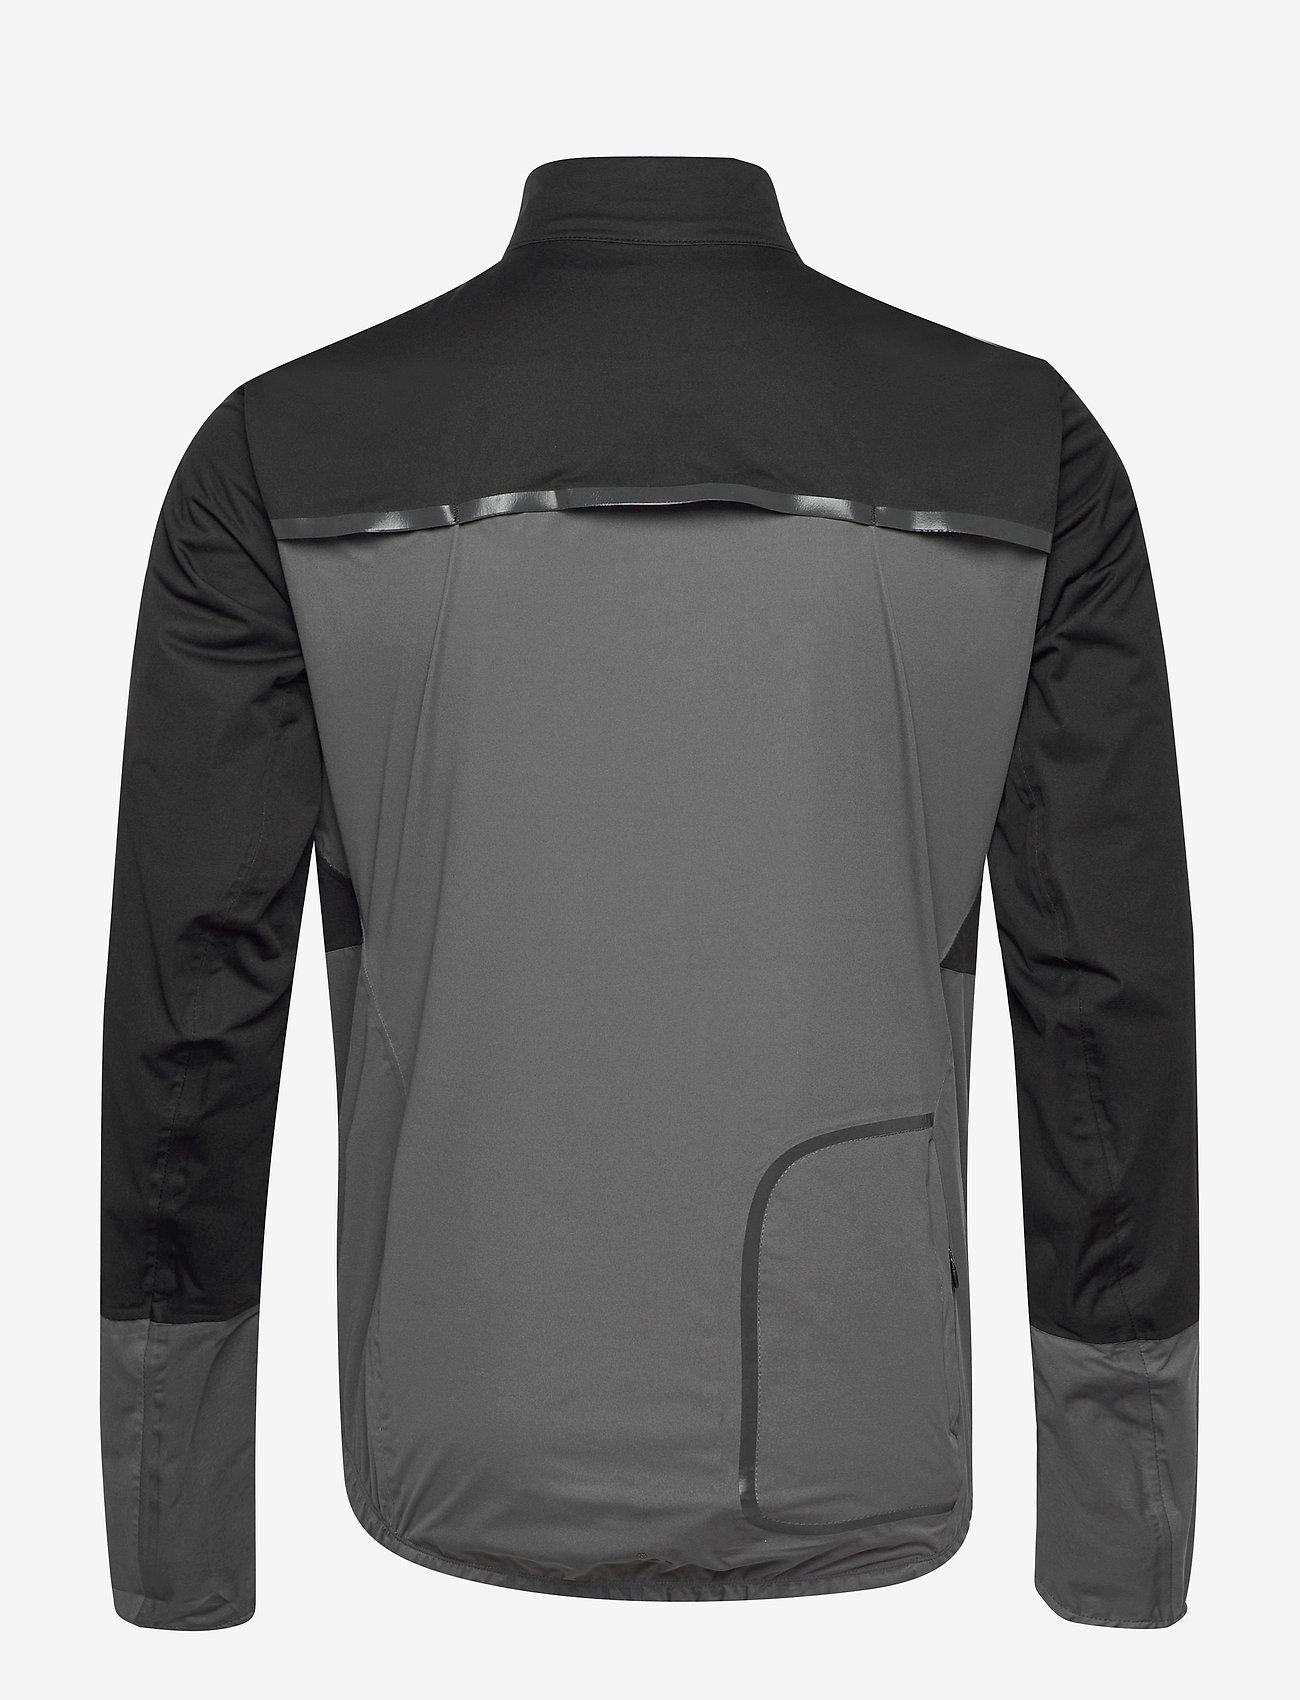 Craft - Adv Endur Hydro Jkt M - sportjassen - black-granite - 1